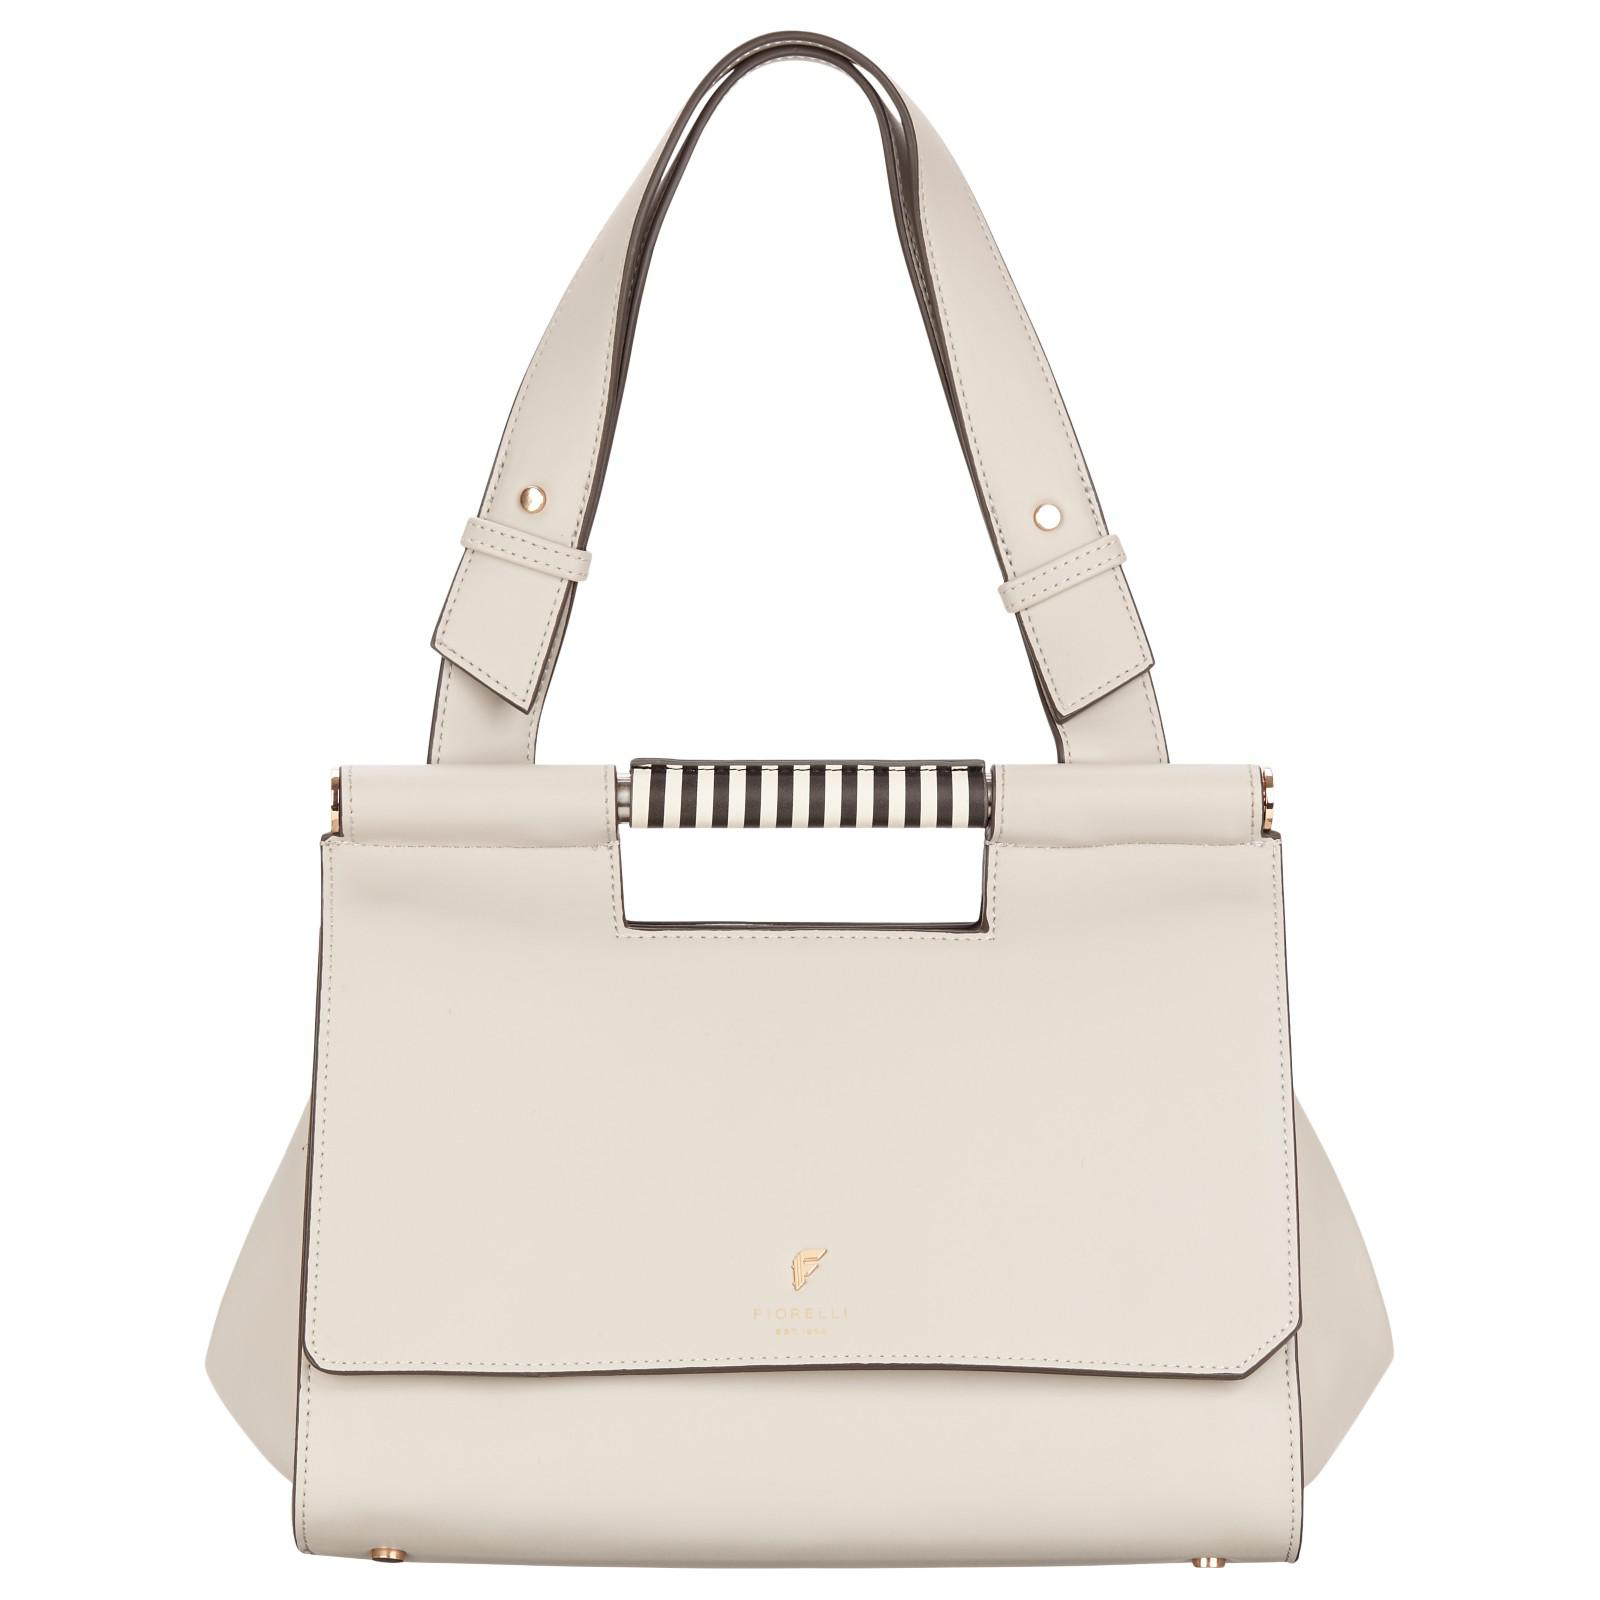 3c7a82d29eb7 Fiorelli Austin Satchel Bag in Gray - Lyst